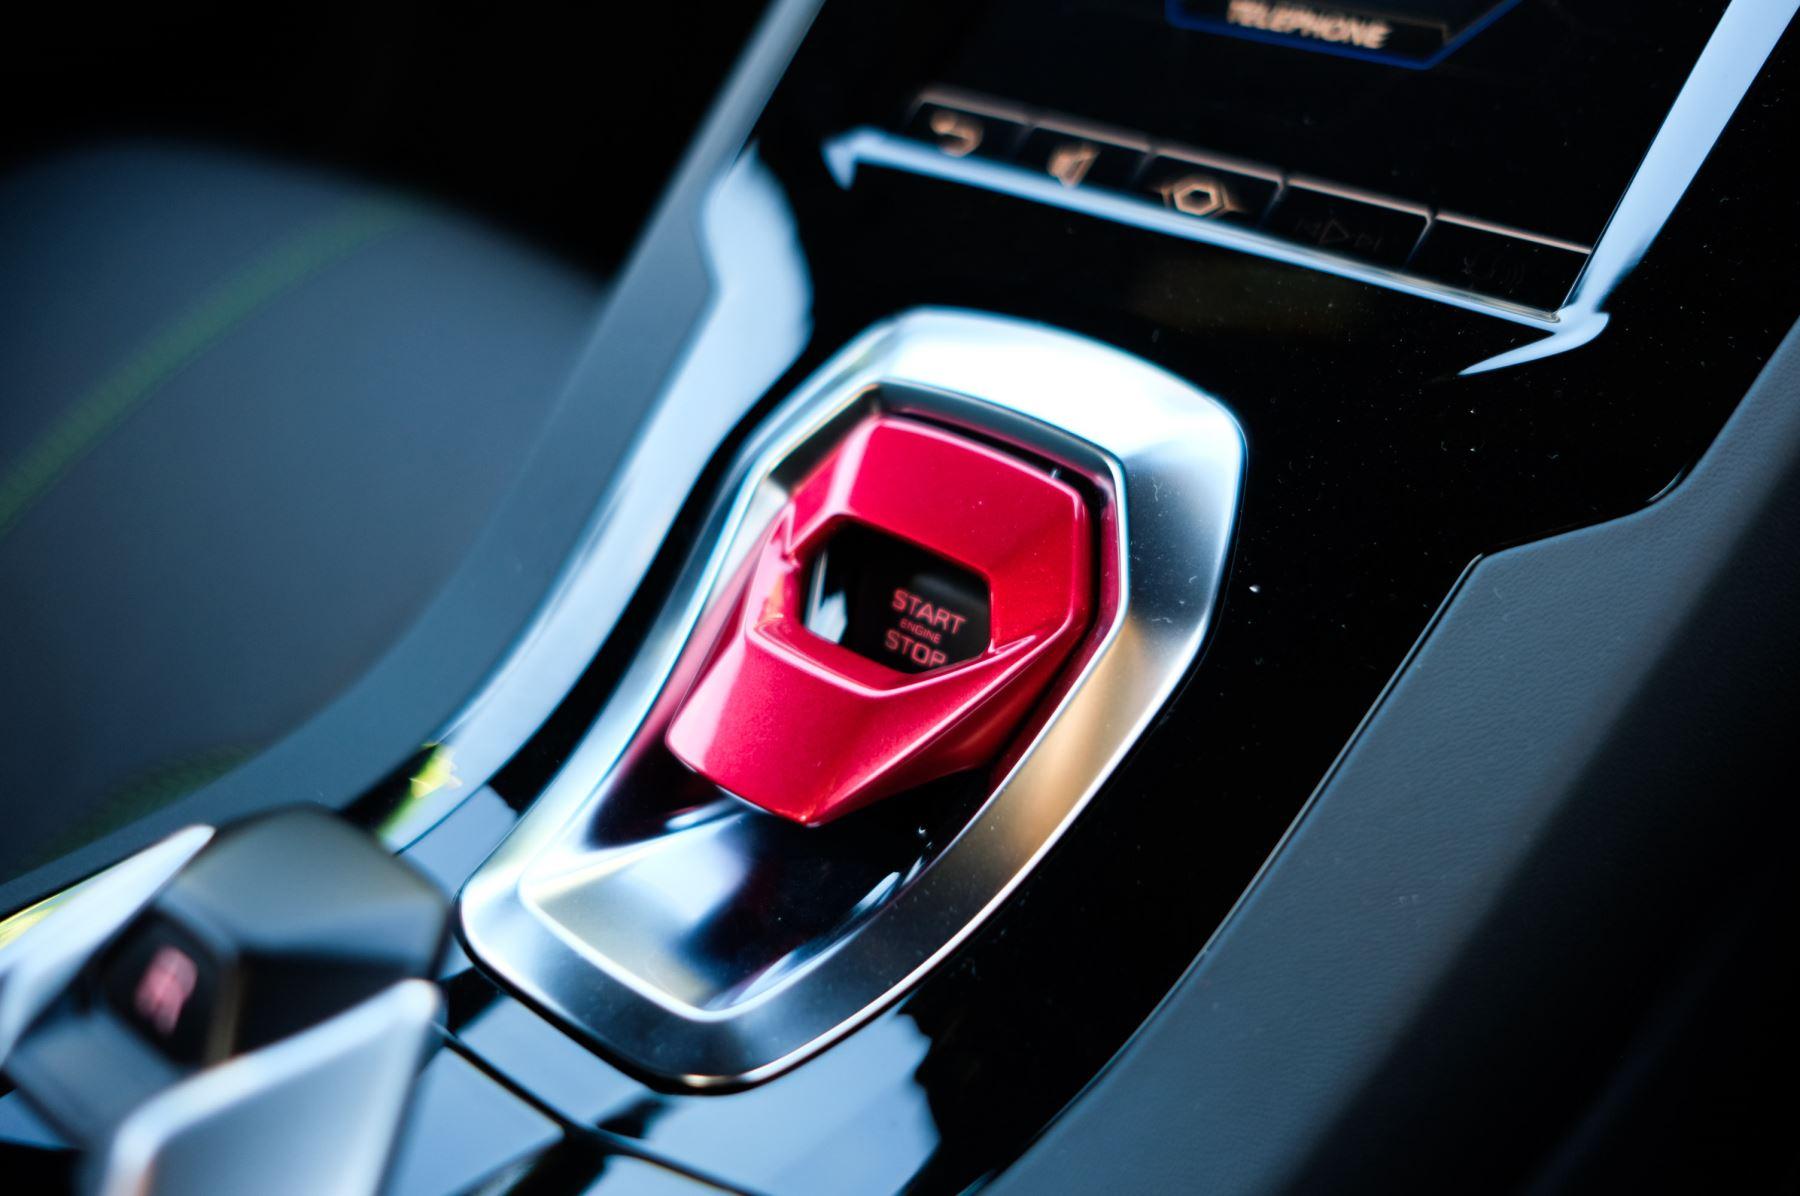 Lamborghini Huracan EVO Spyder 5.2 V10 610 2dr Auto image 19